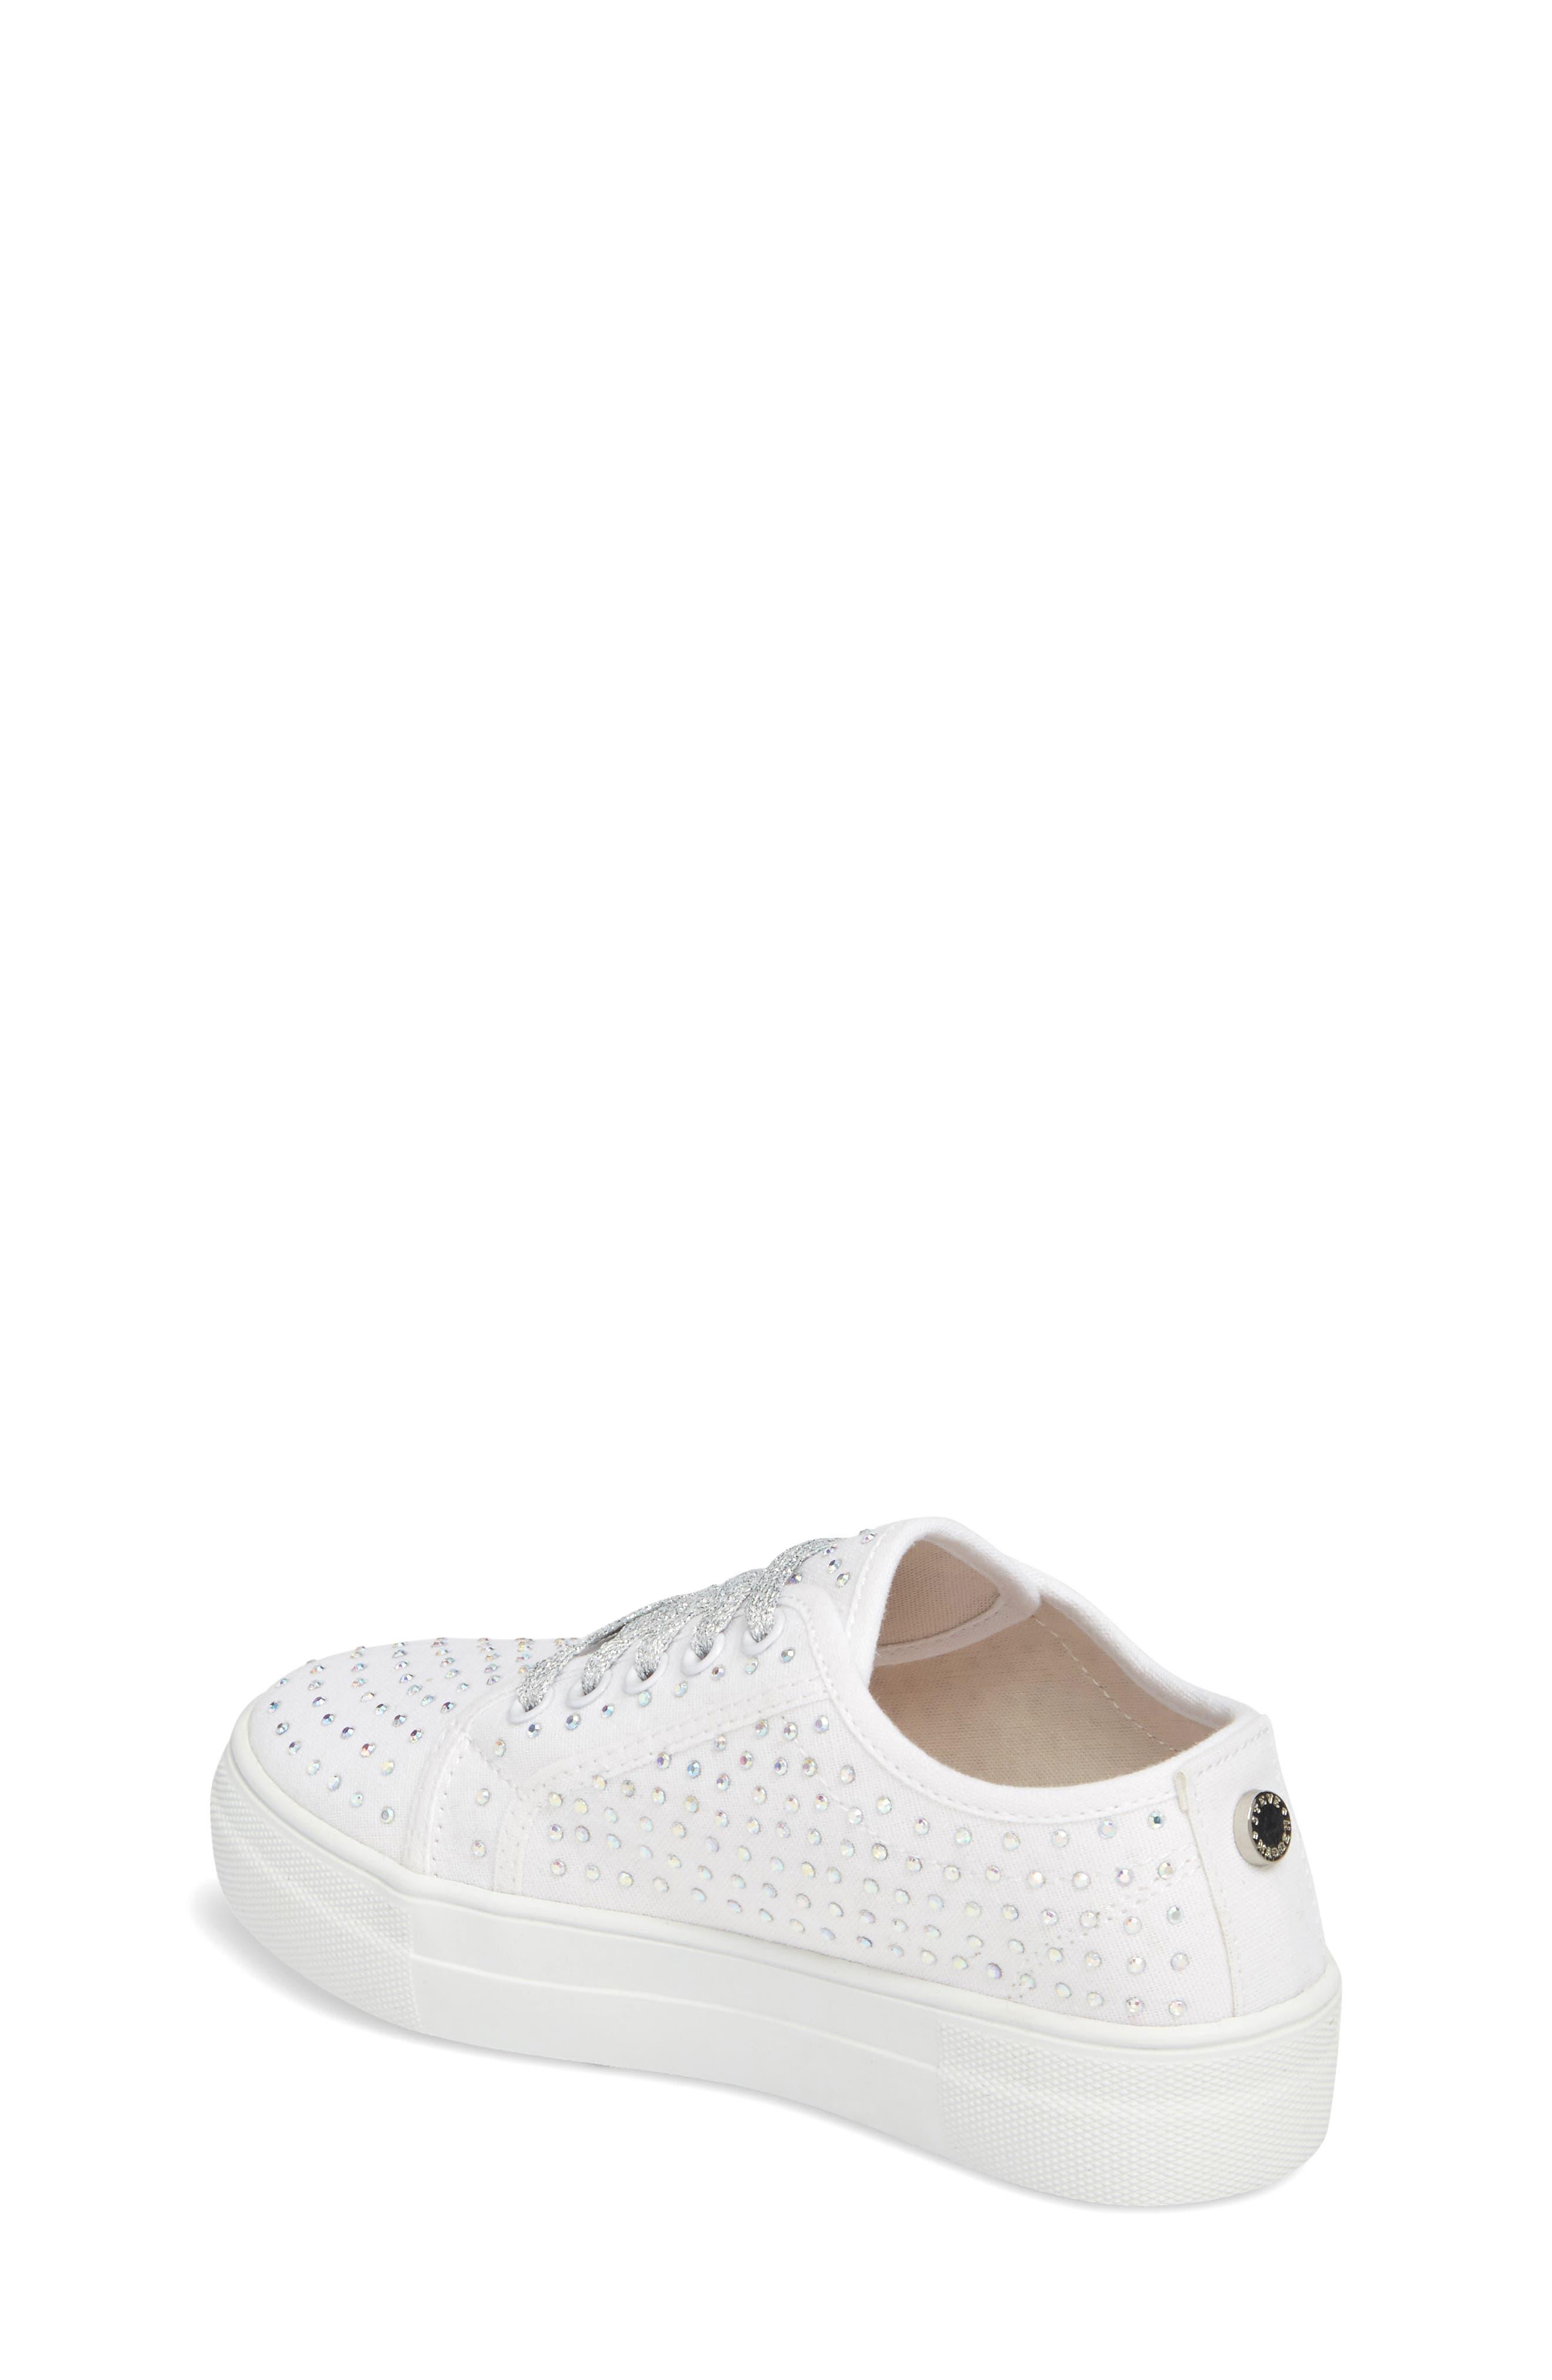 Jmono Sneaker,                             Alternate thumbnail 2, color,                             100